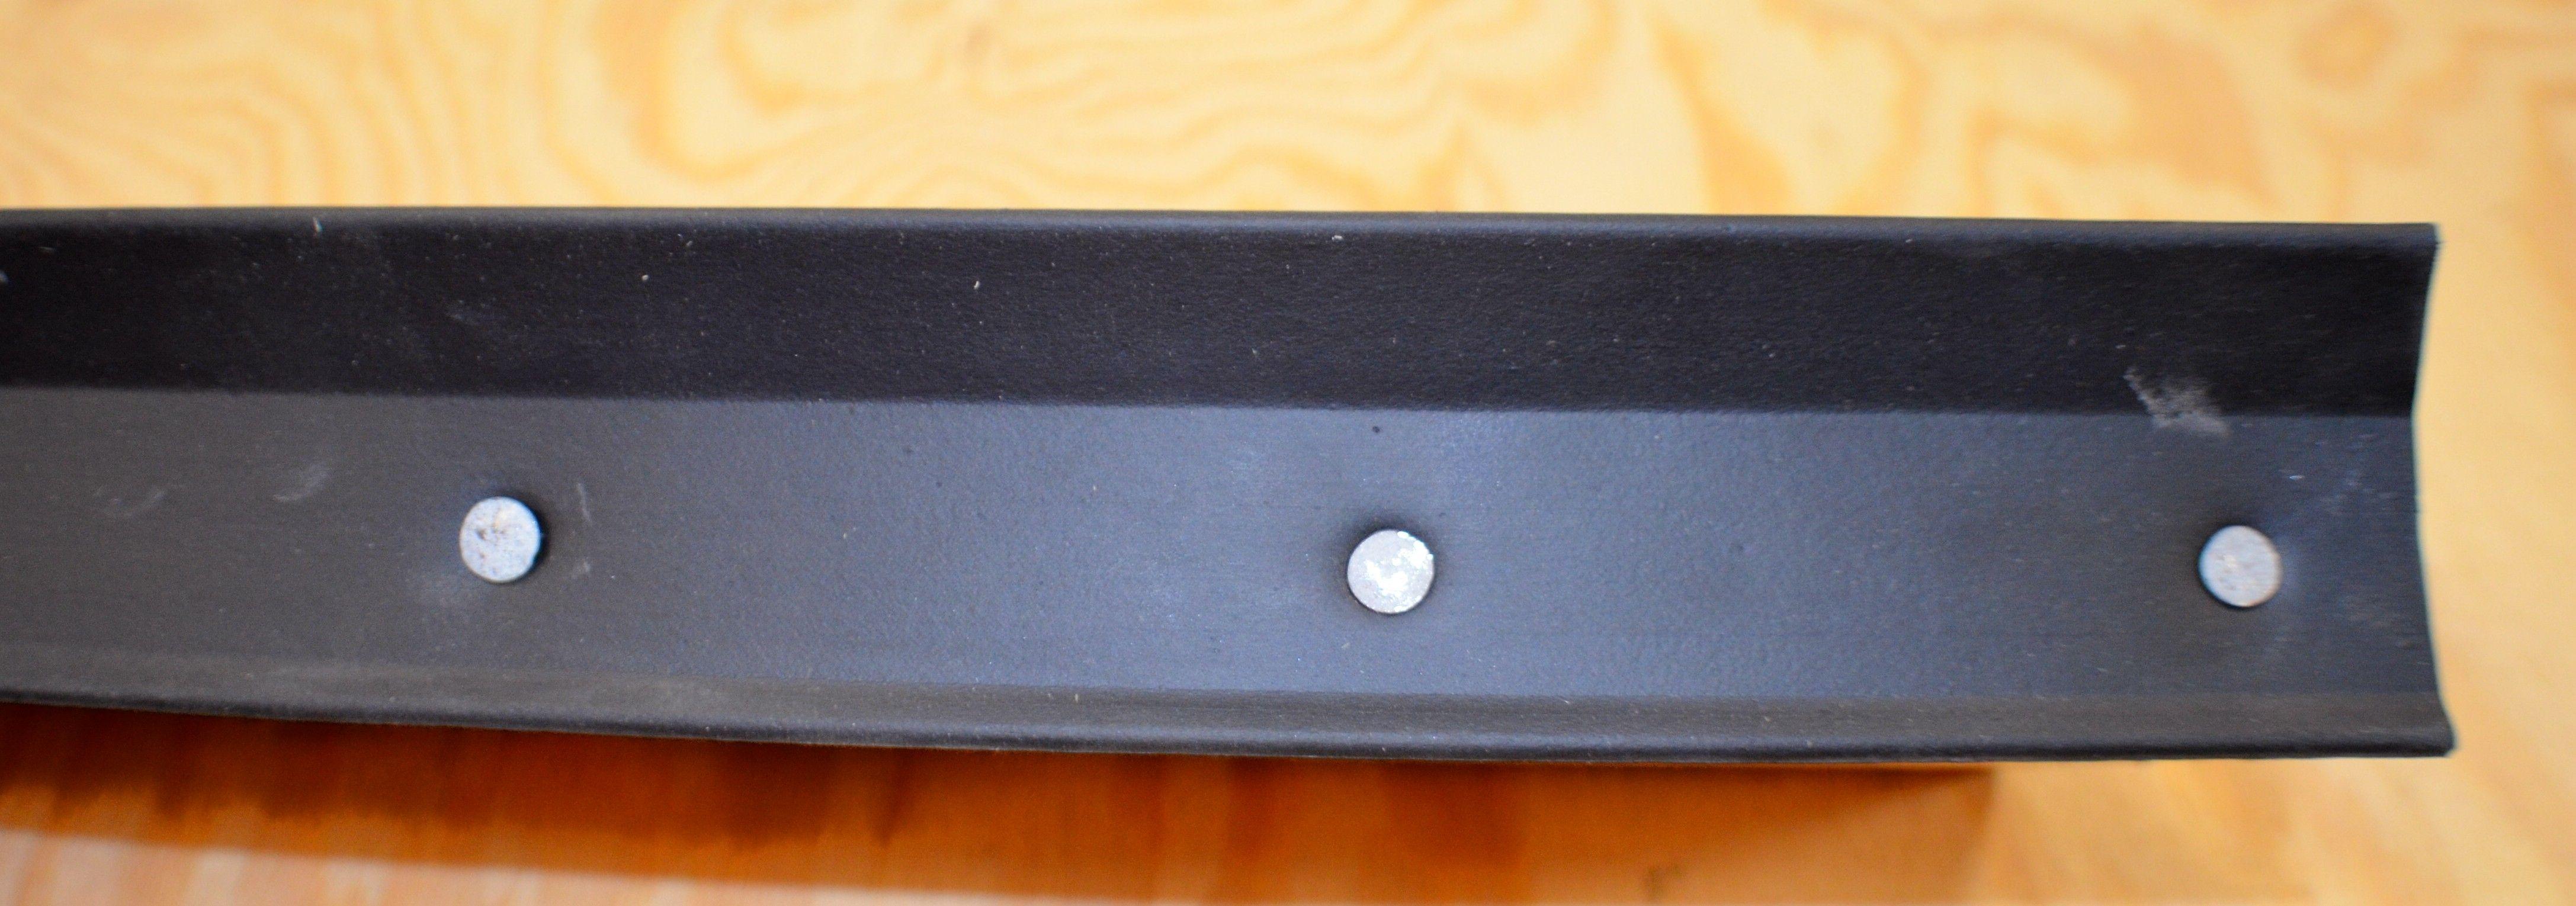 The Stylish Wood Garage Door Nail On Bottom Seal Pertaining To